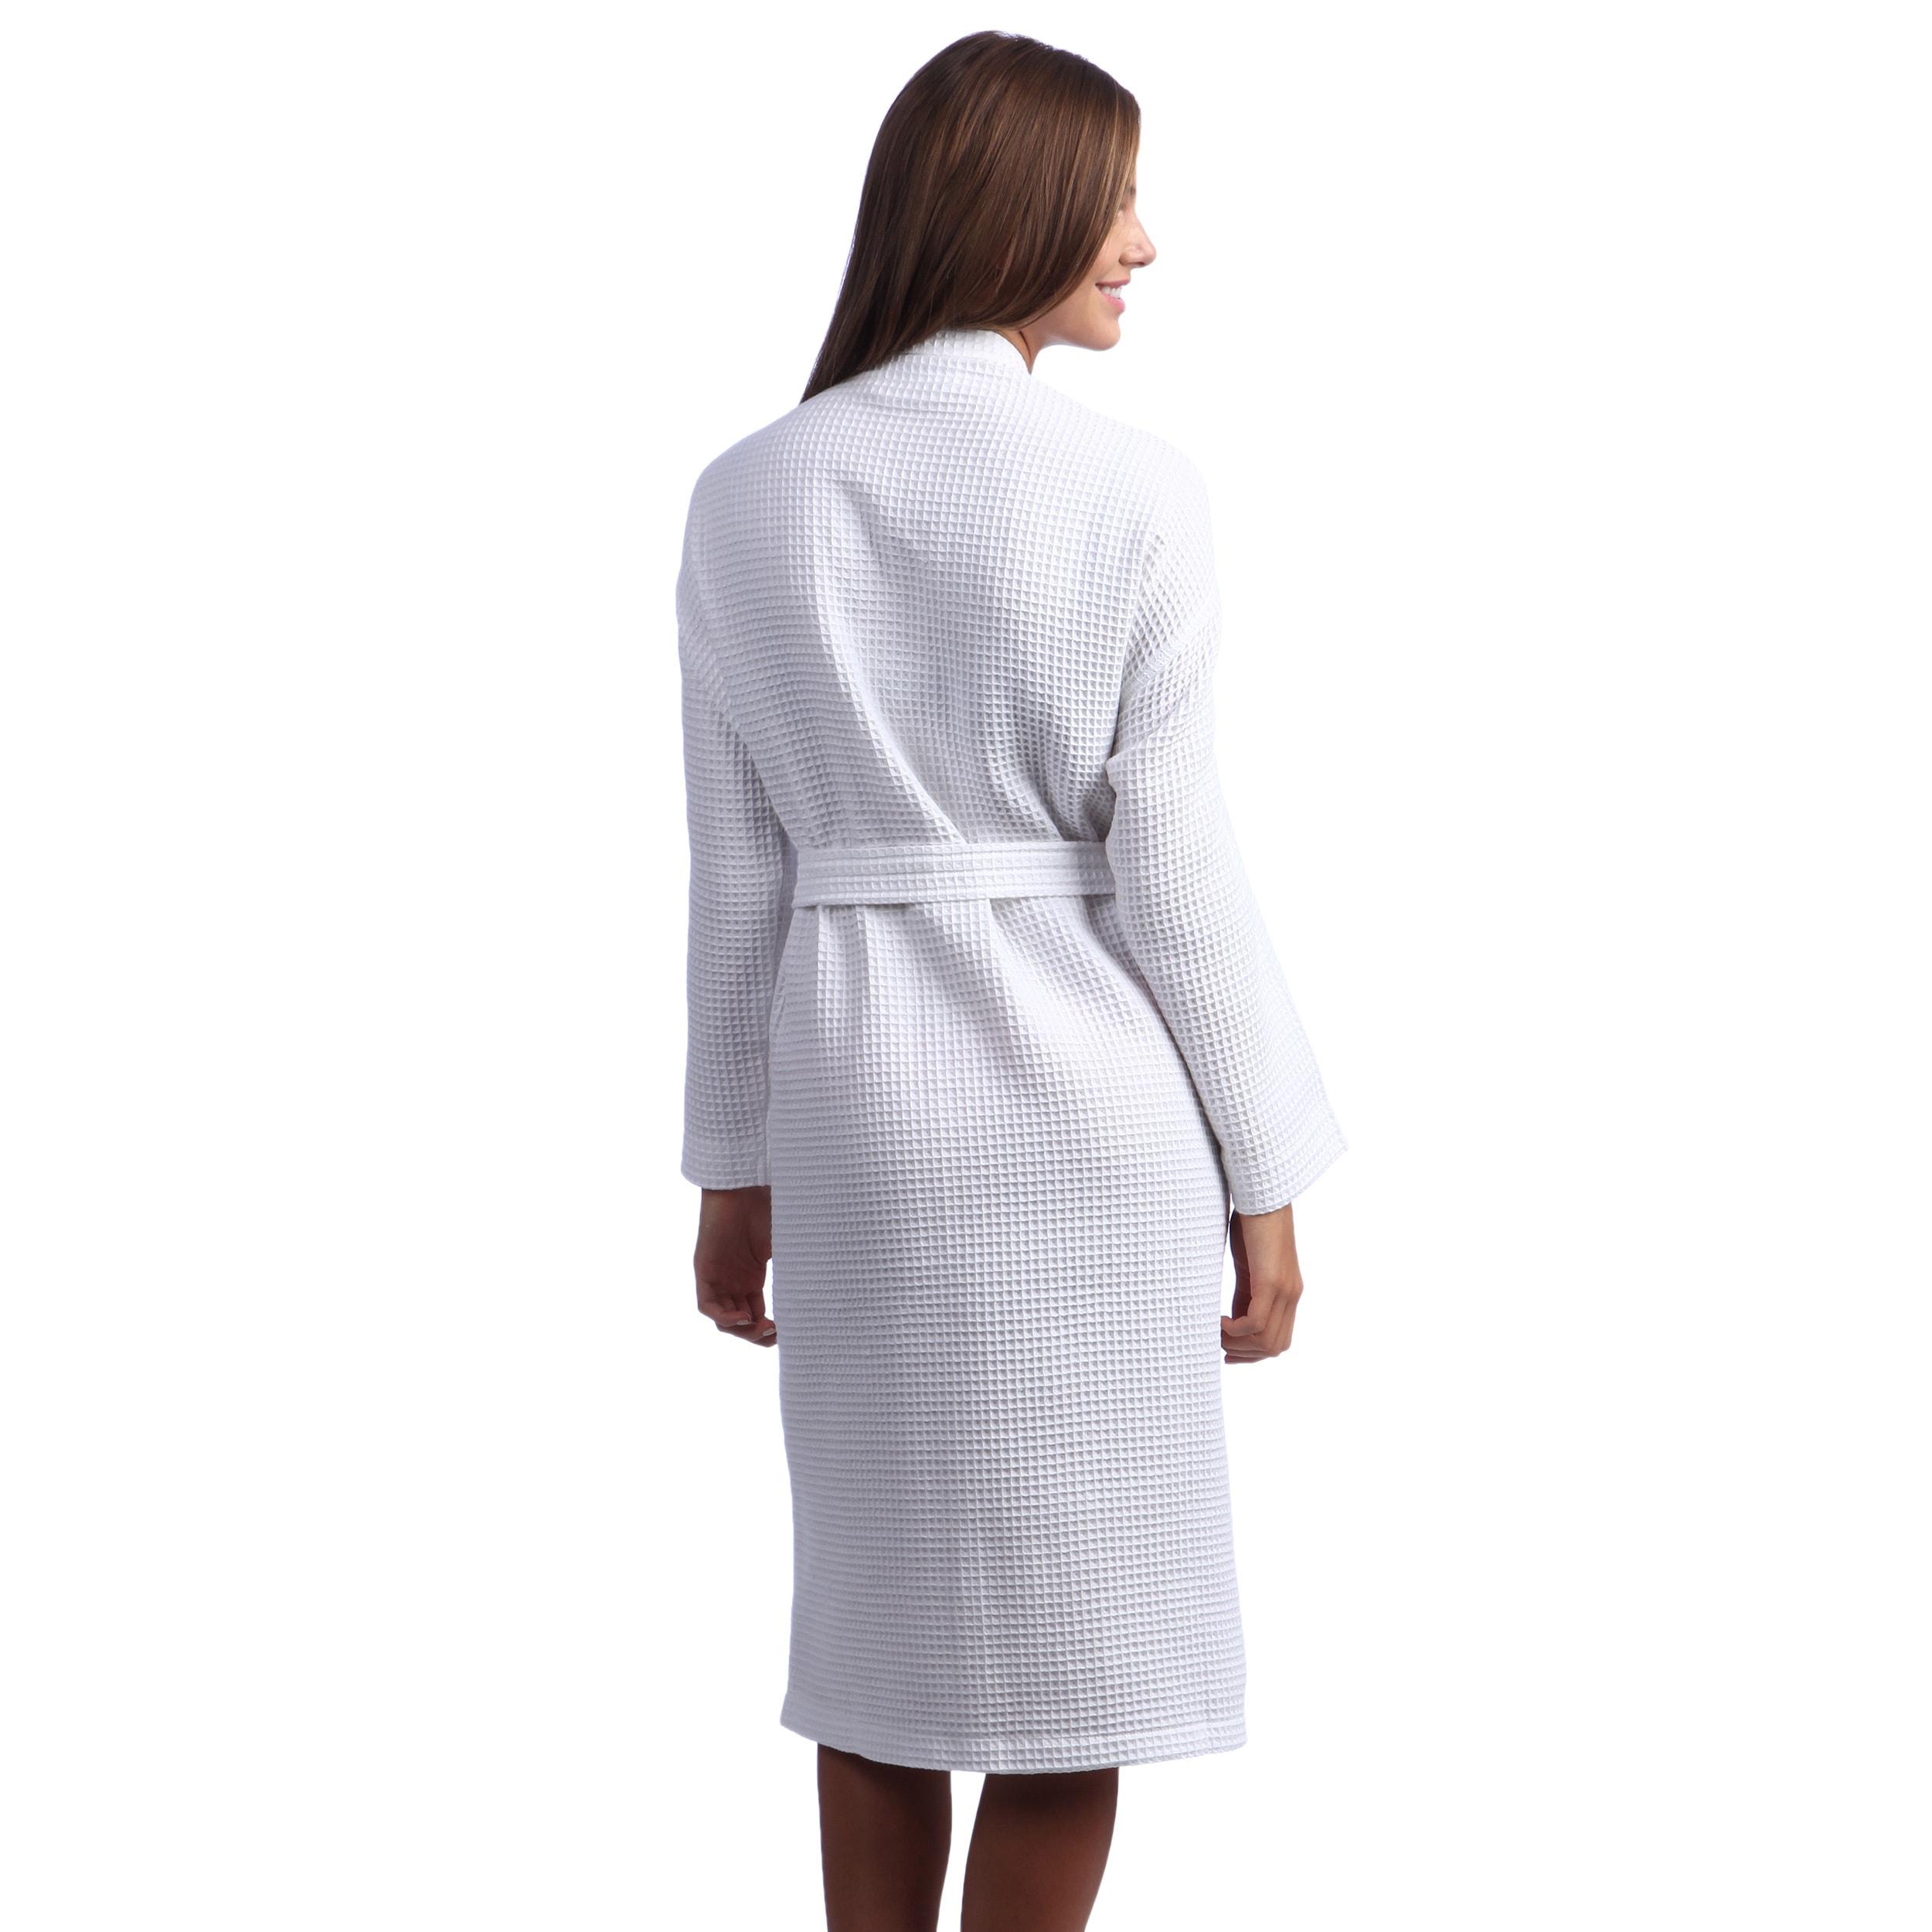 Bath Additional Name Monogram Premium Unisex Kimono Waffle Cotton Bathrobes White Home Furniture Diy Tohoku Morinagamilk Co Jp